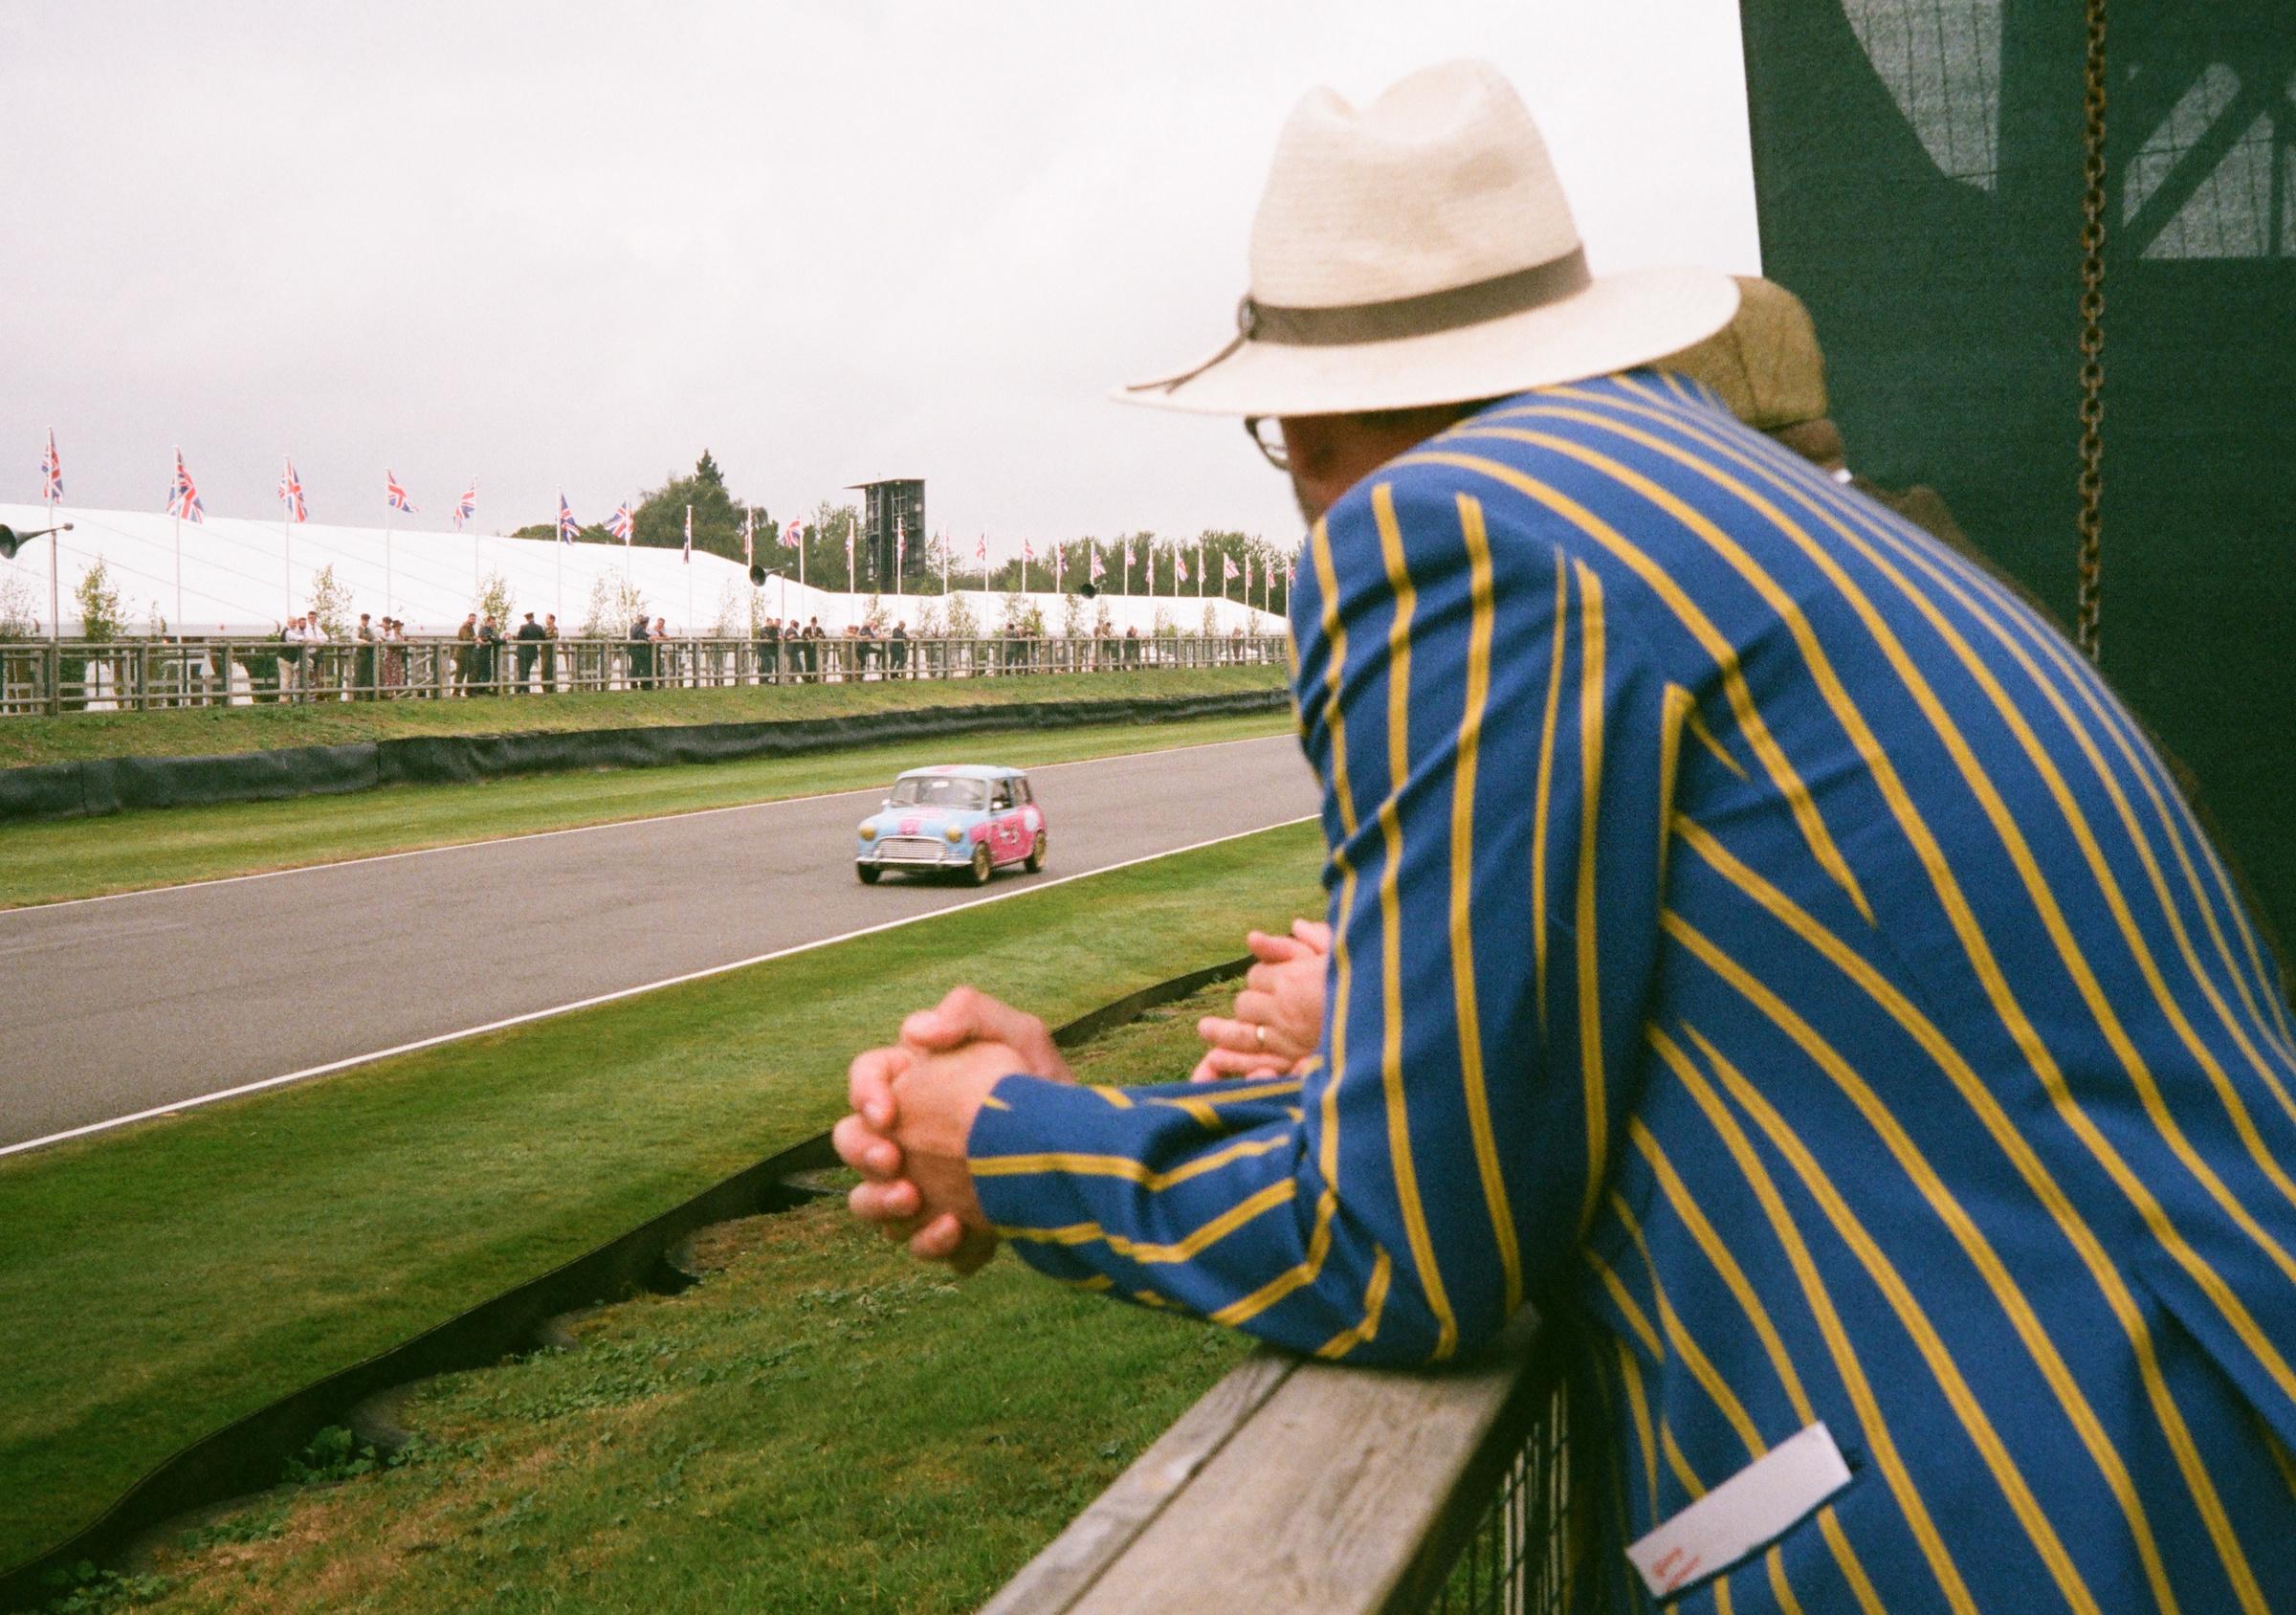 Goodwood Revival film spectating races